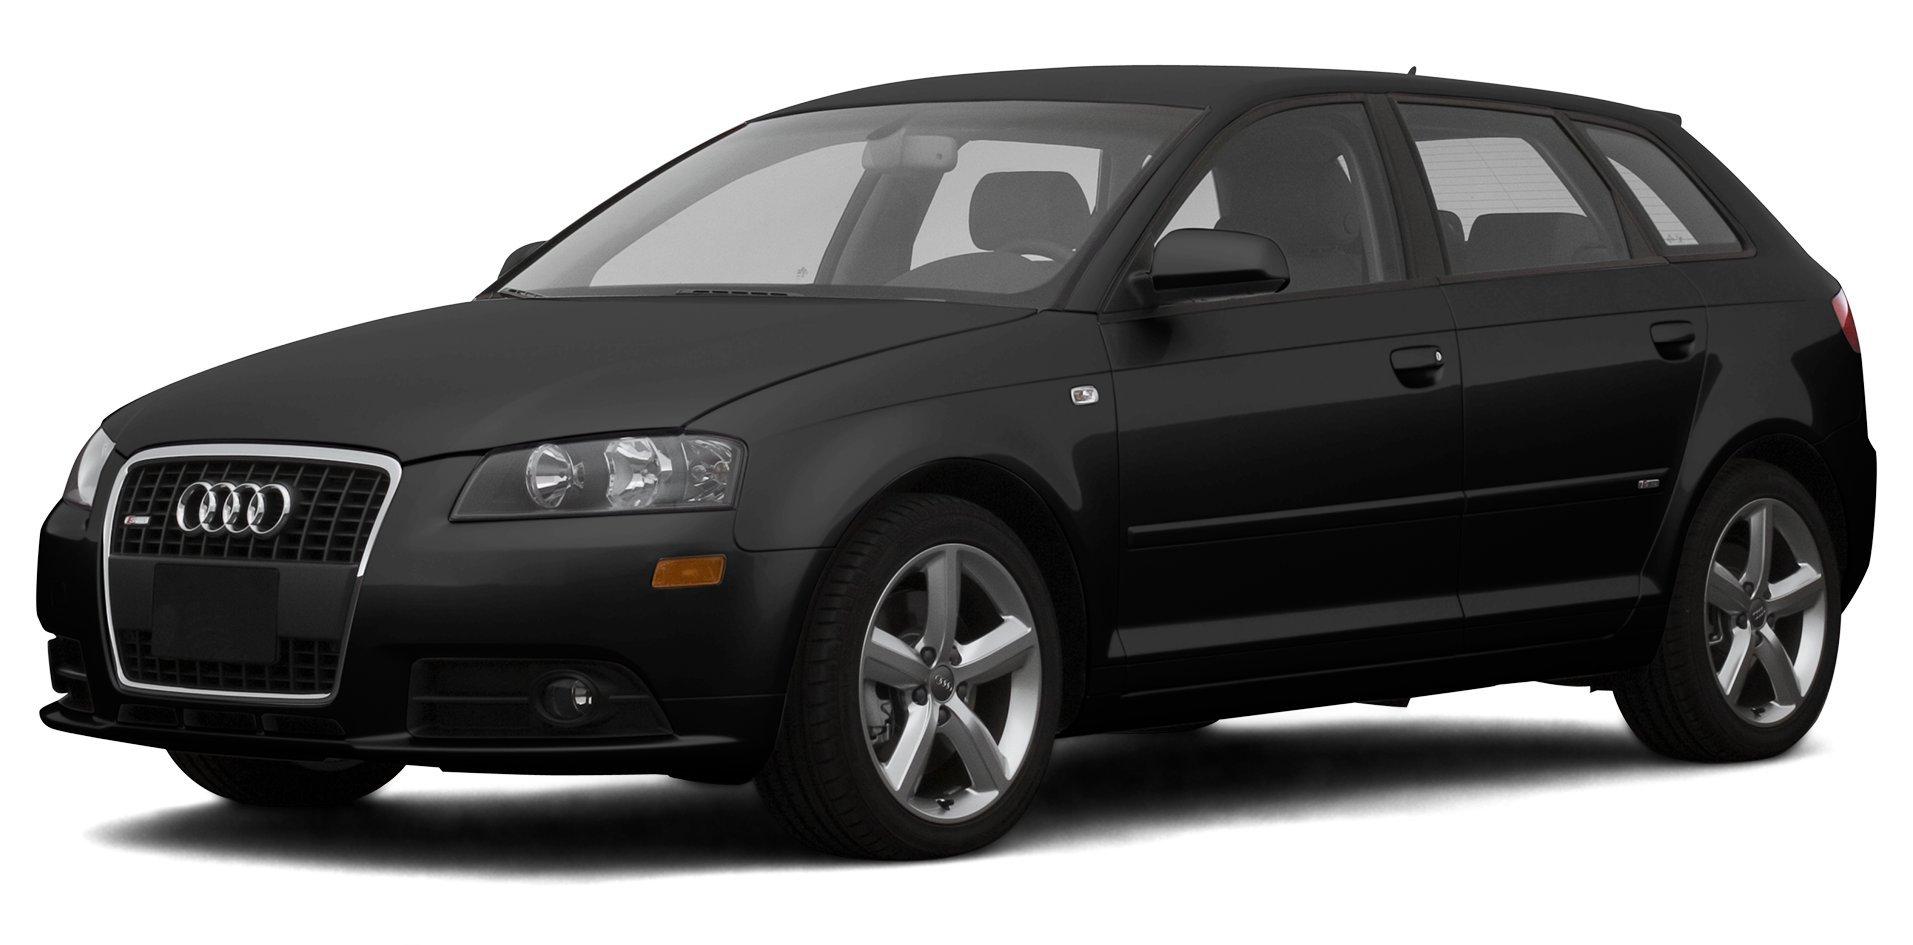 Kekurangan Audi A3 2007 Tangguh